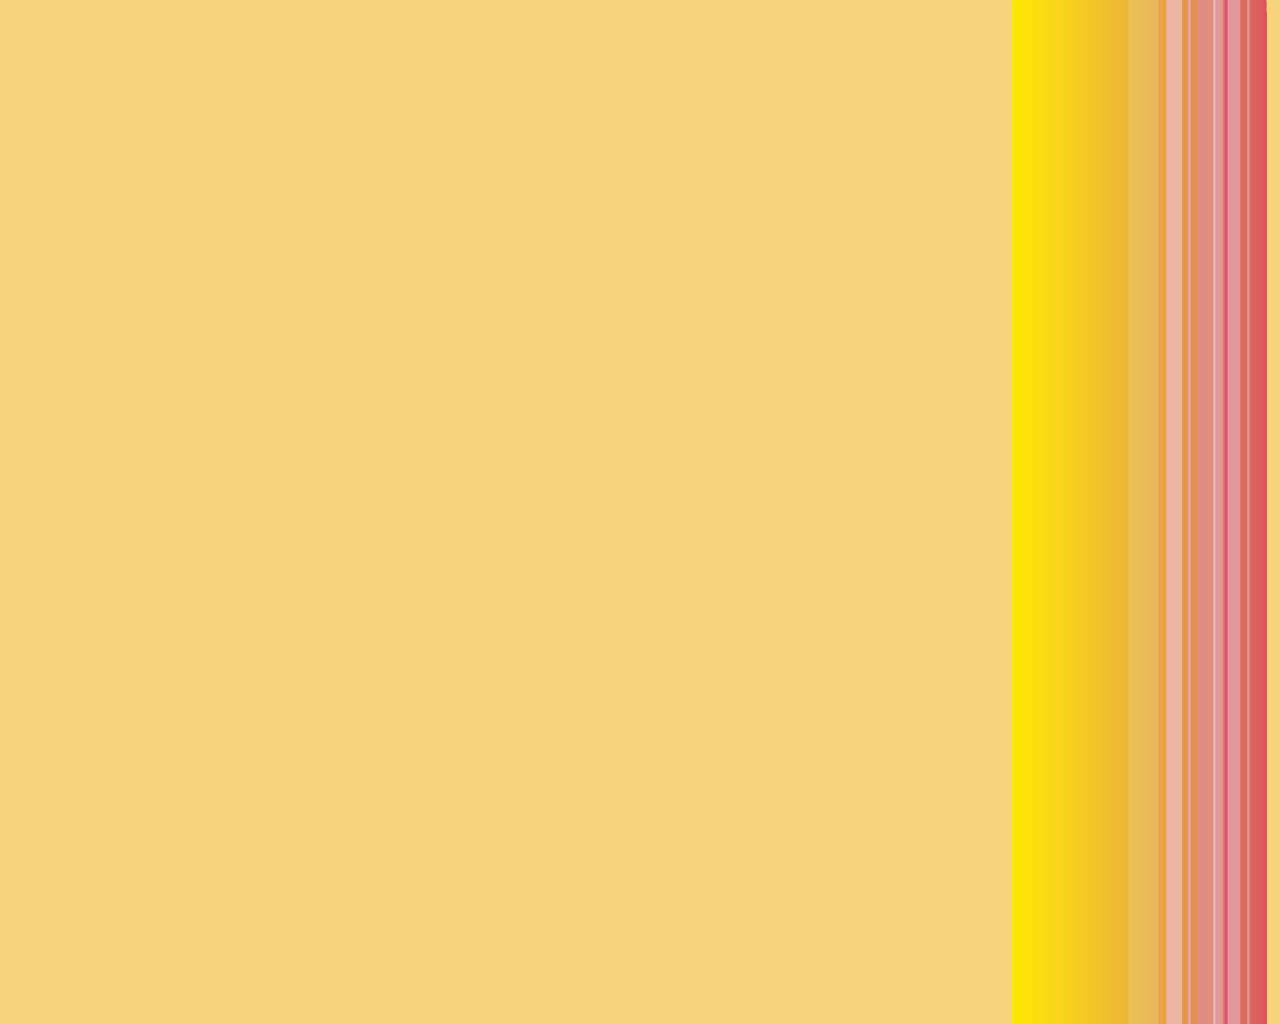 download free powerpoint slides design design stripes for template